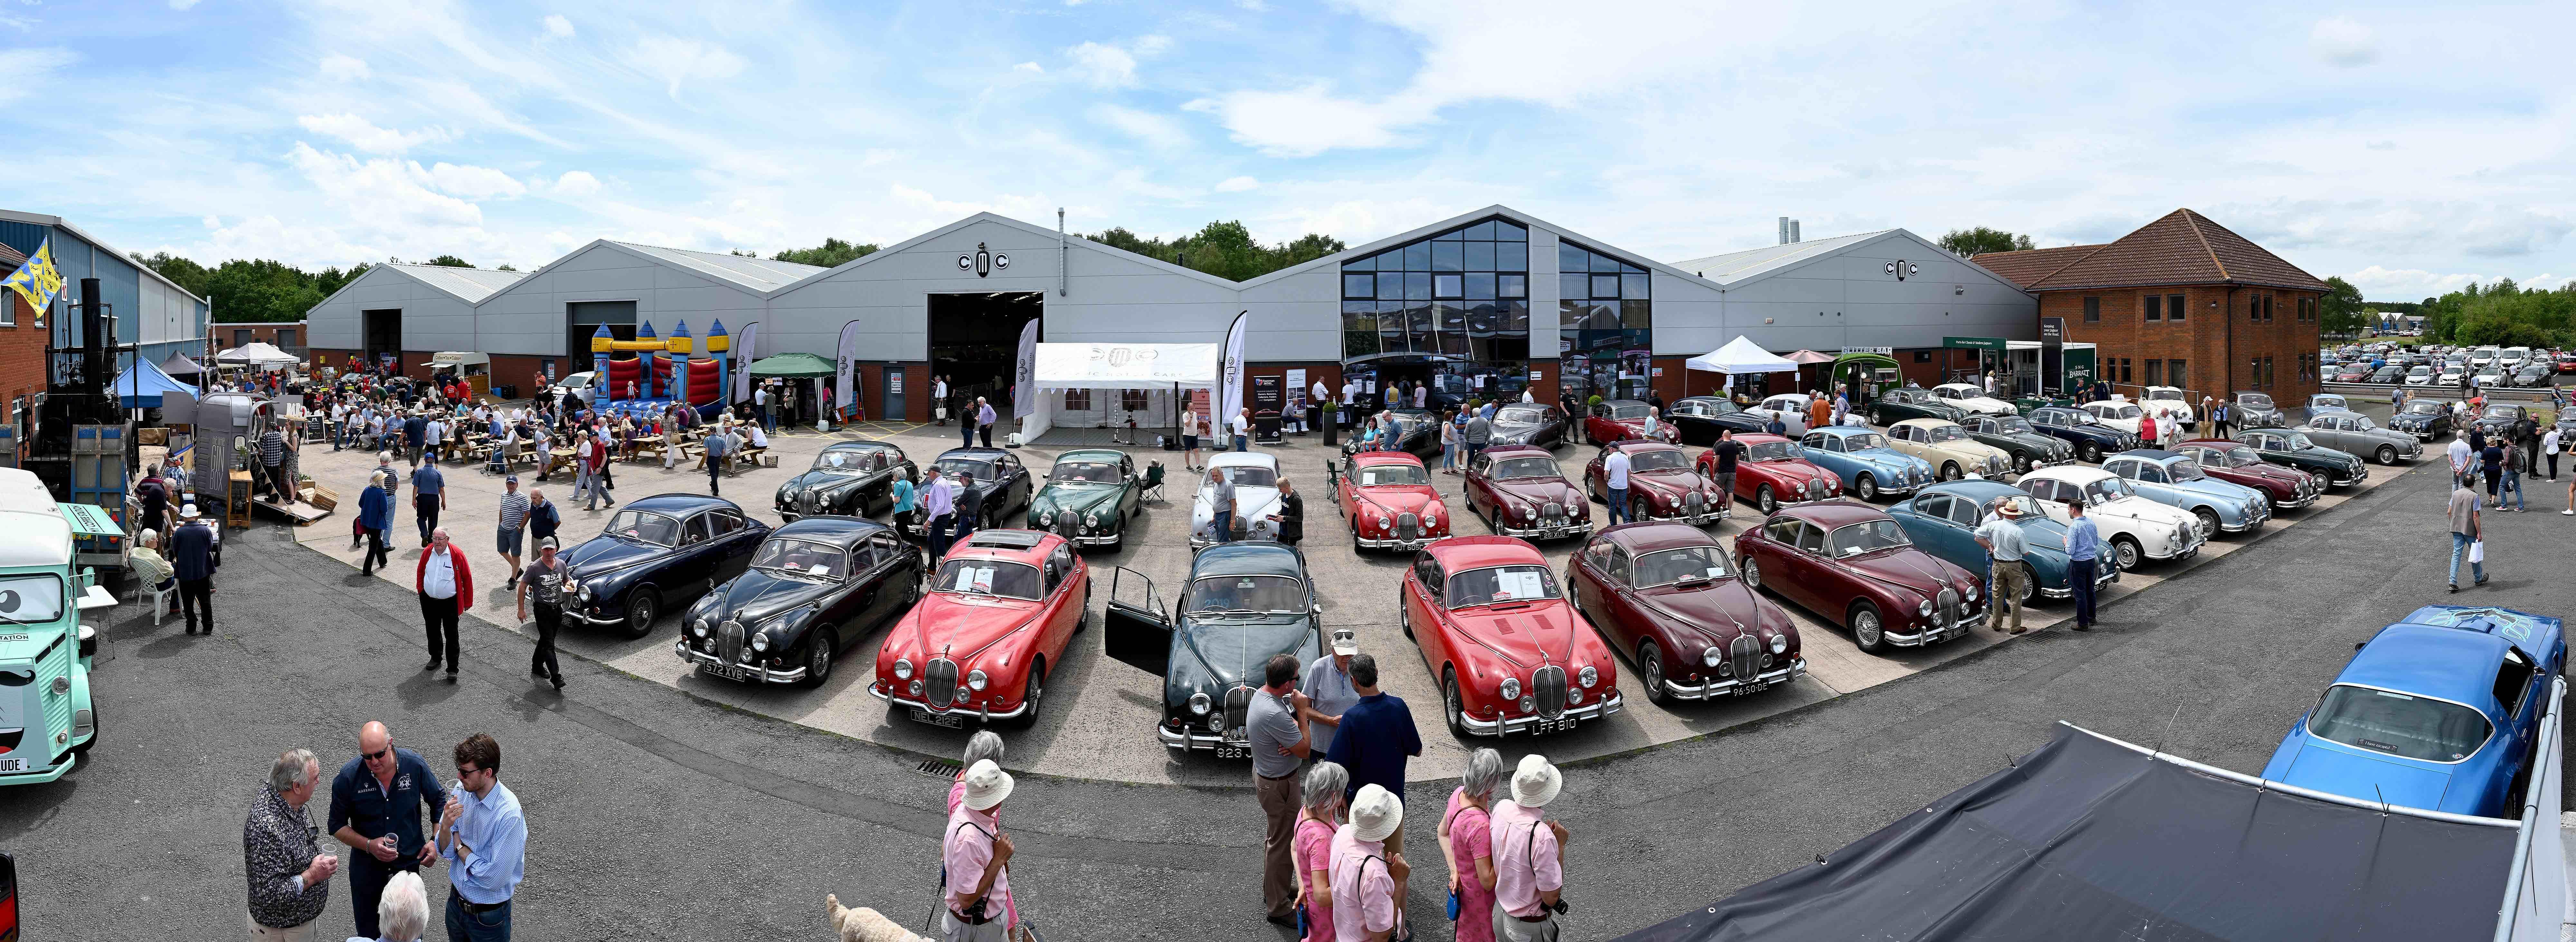 Jaguar Mk 2, Jaguar Mk 2 birthday bash draws cars, crowd, ClassicCars.com Journal